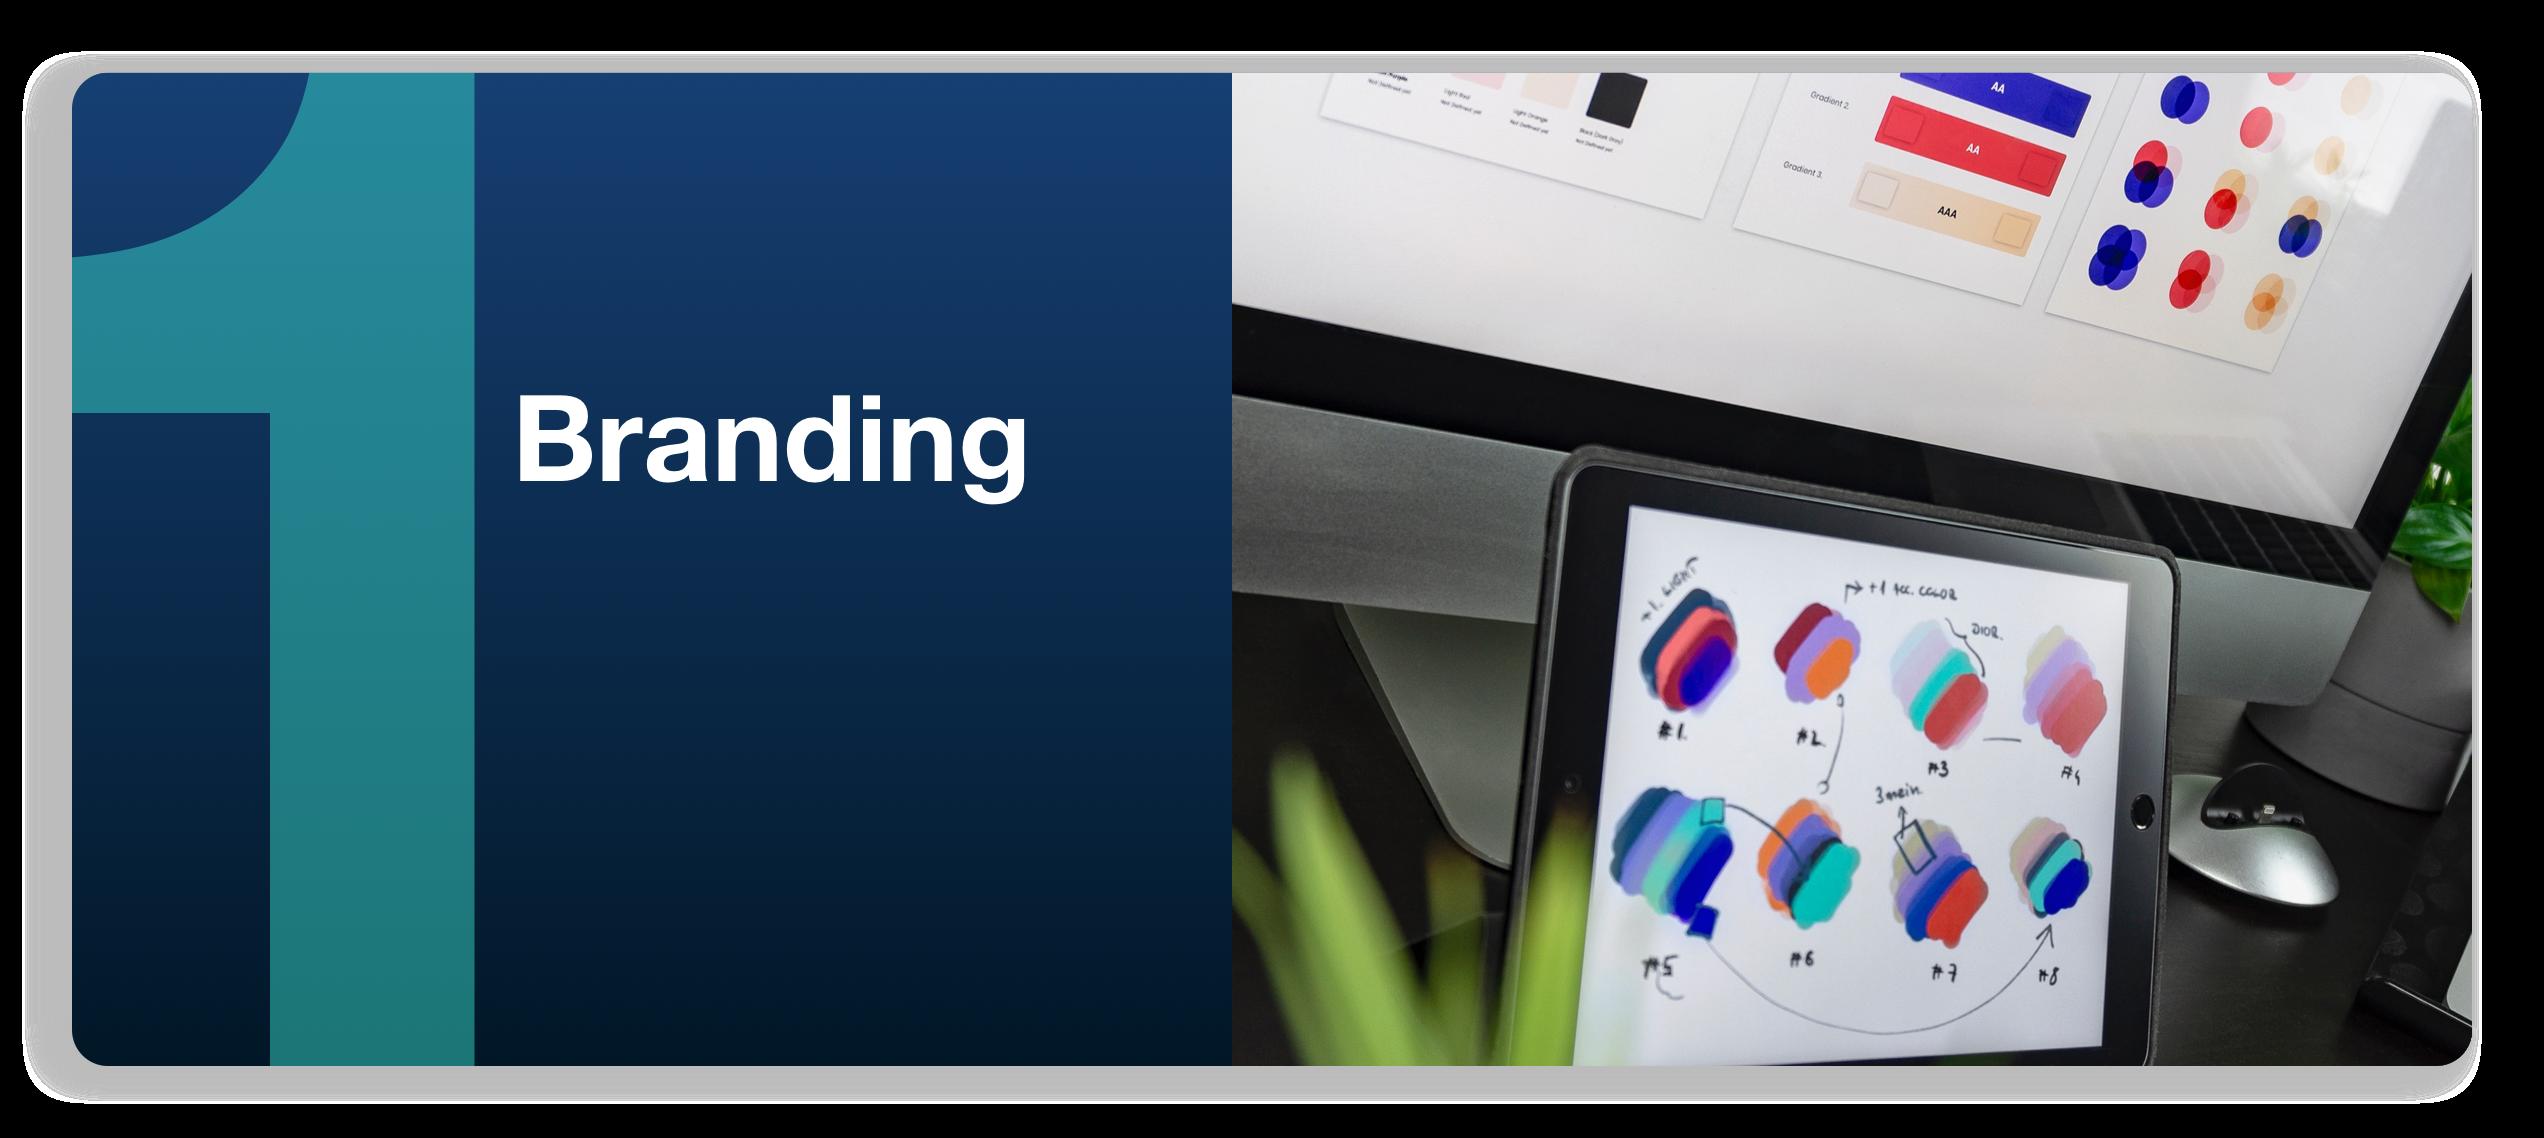 how-to-make-an-app-step-1-branding